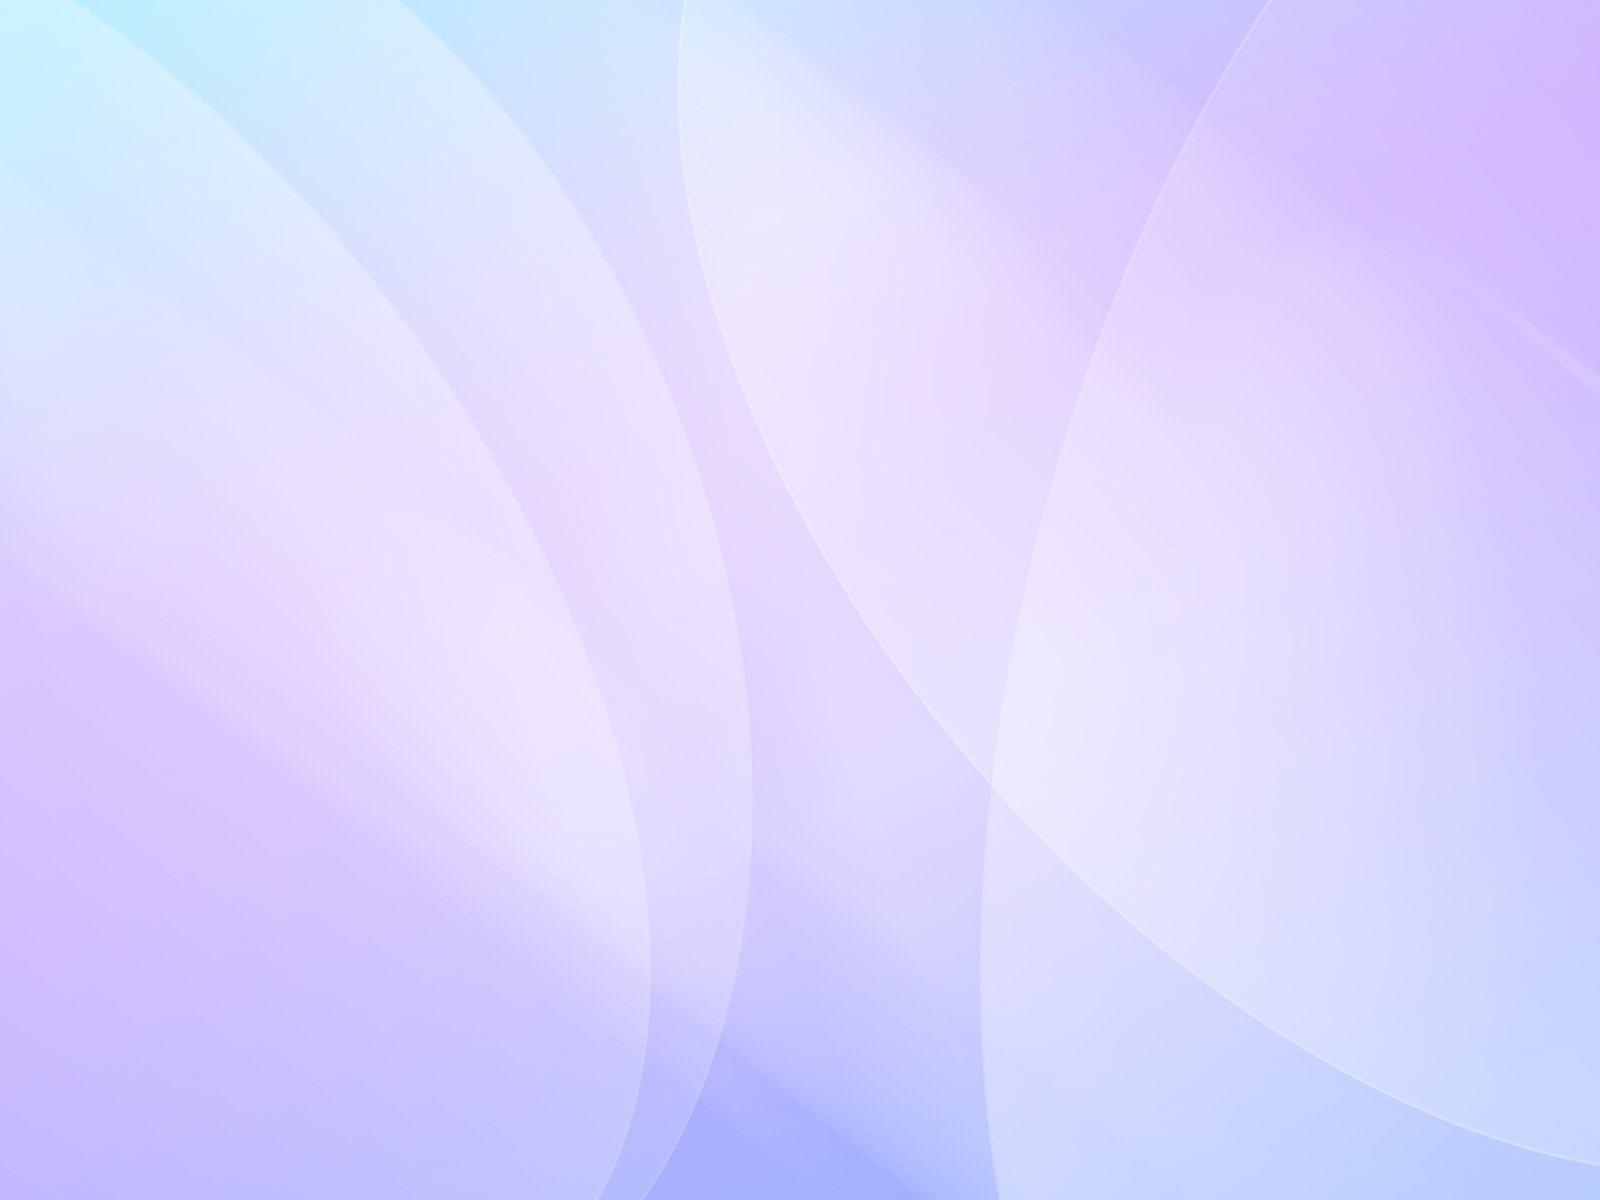 Pastel Desktop and mobile wallpaper Wallippo 1600x1200